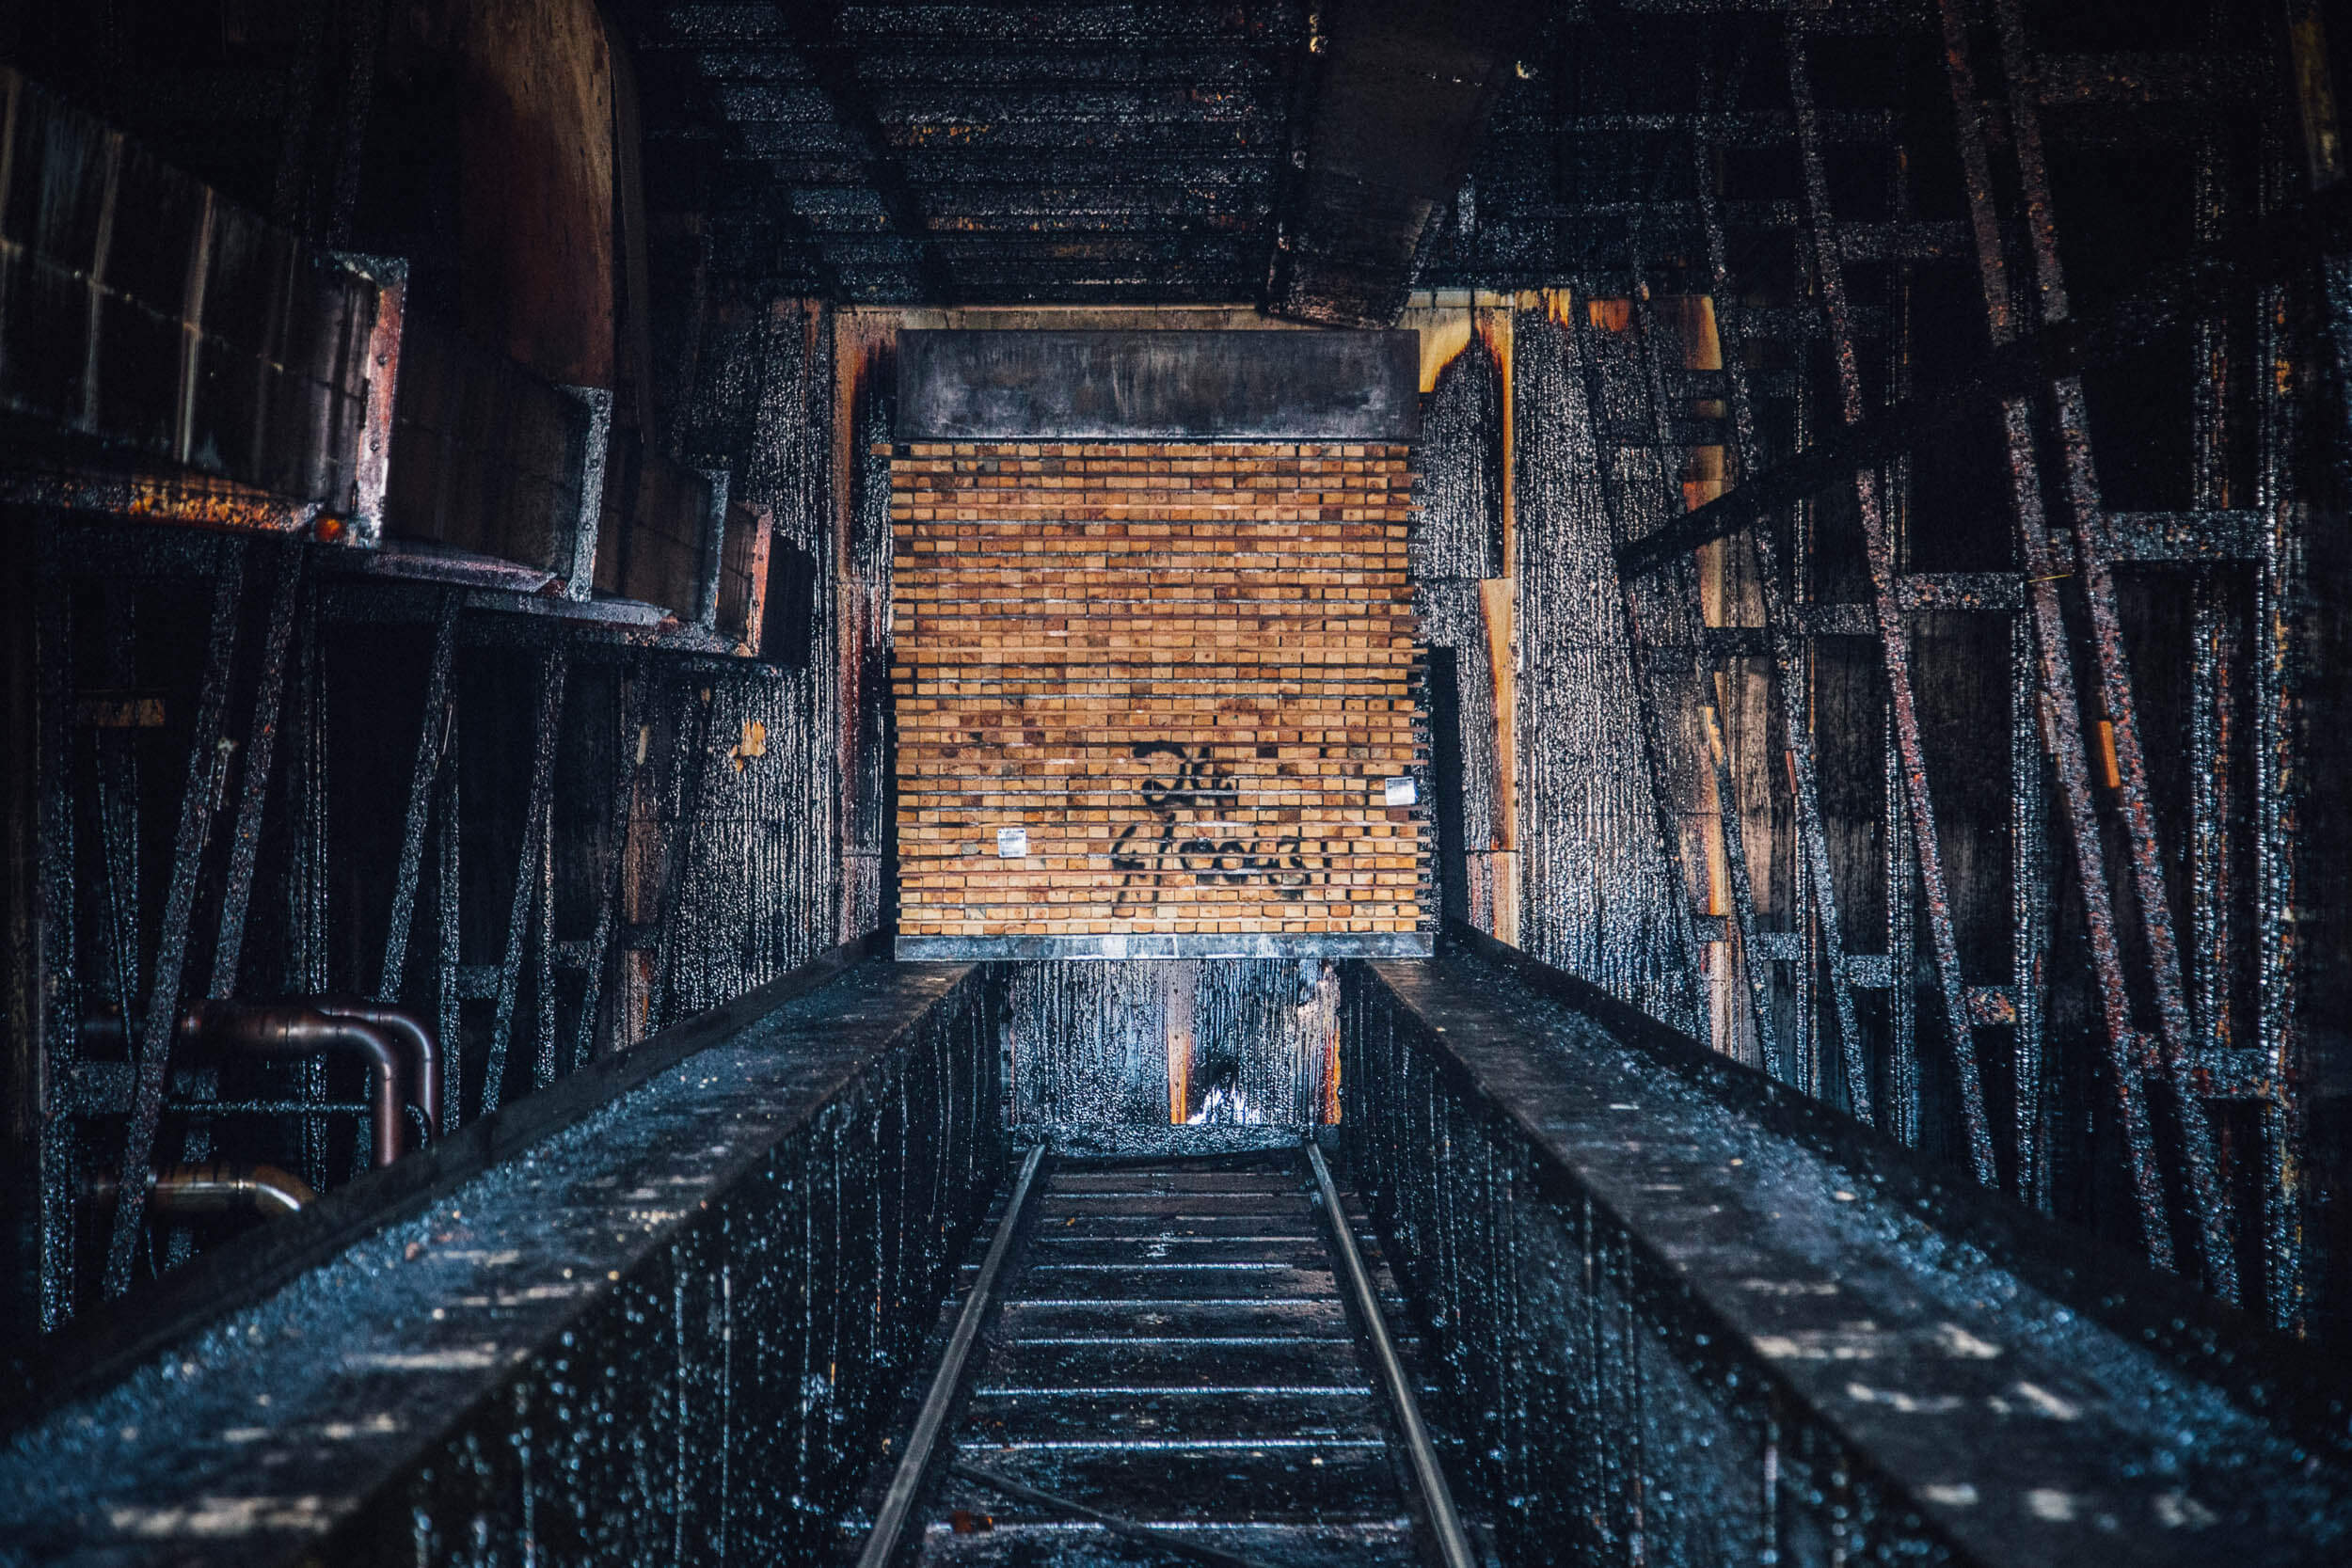 The insides of a kiln